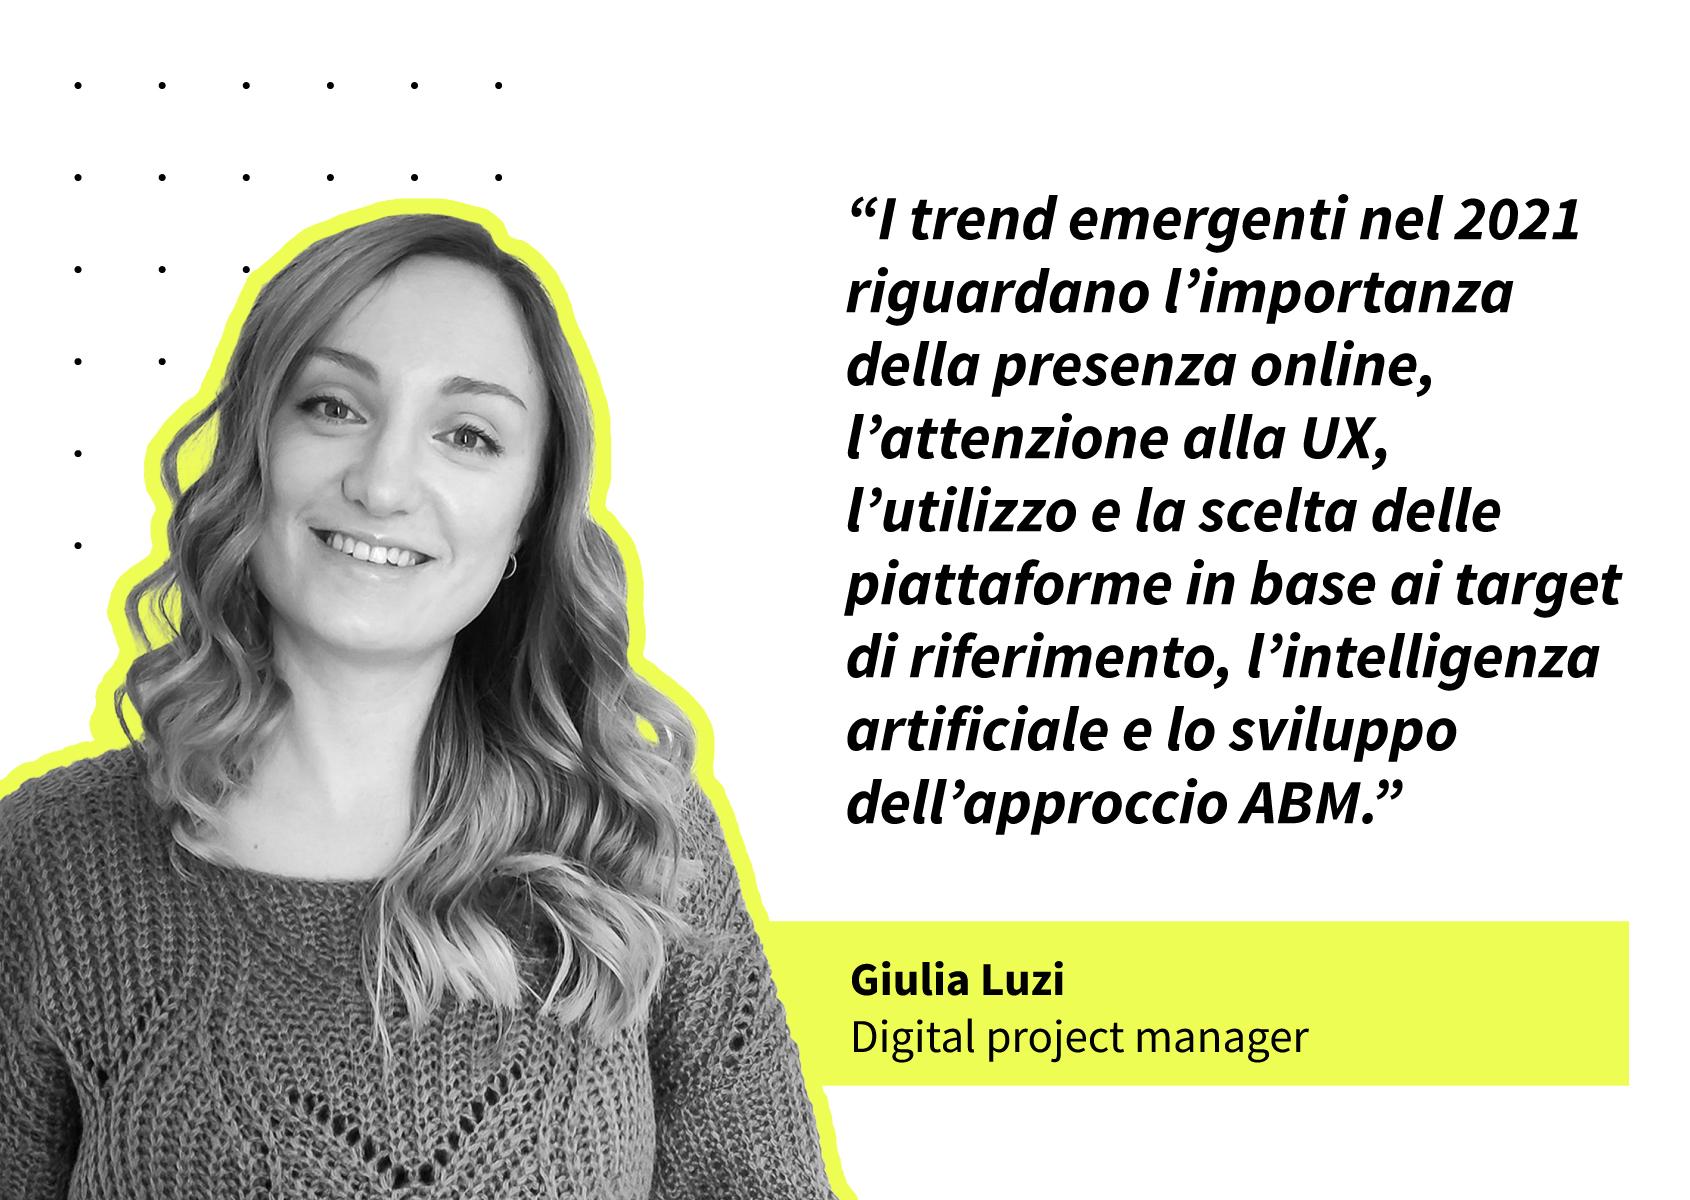 B2B-mkt-trend-2021-quote-giulia